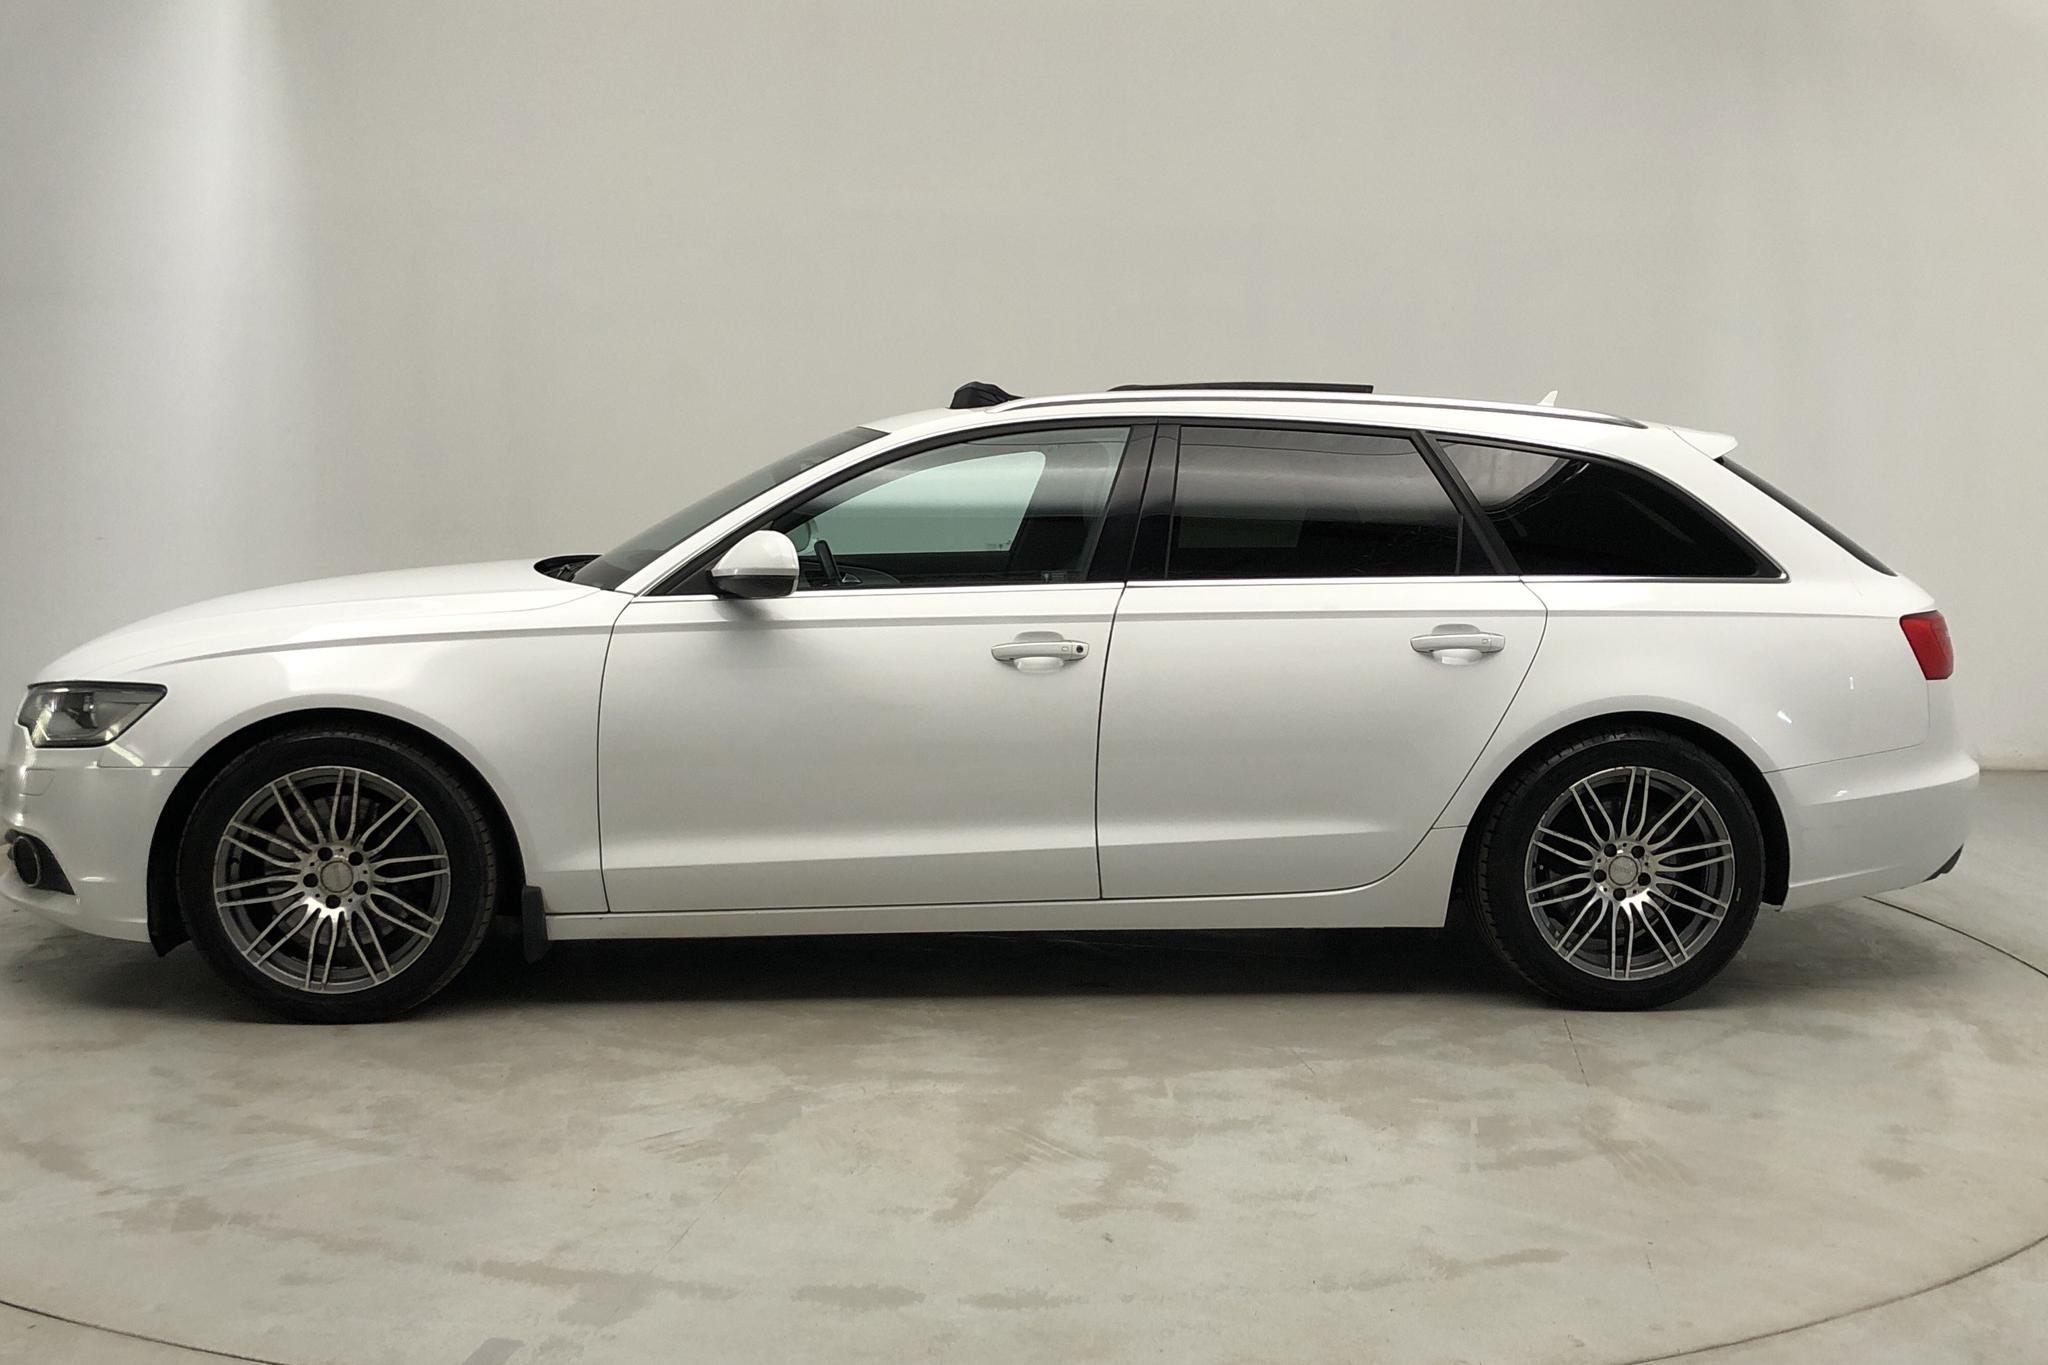 Audi A6 3.0 TDI Avant quattro (245hk) - 207 700 km - Automatic - white - 2012